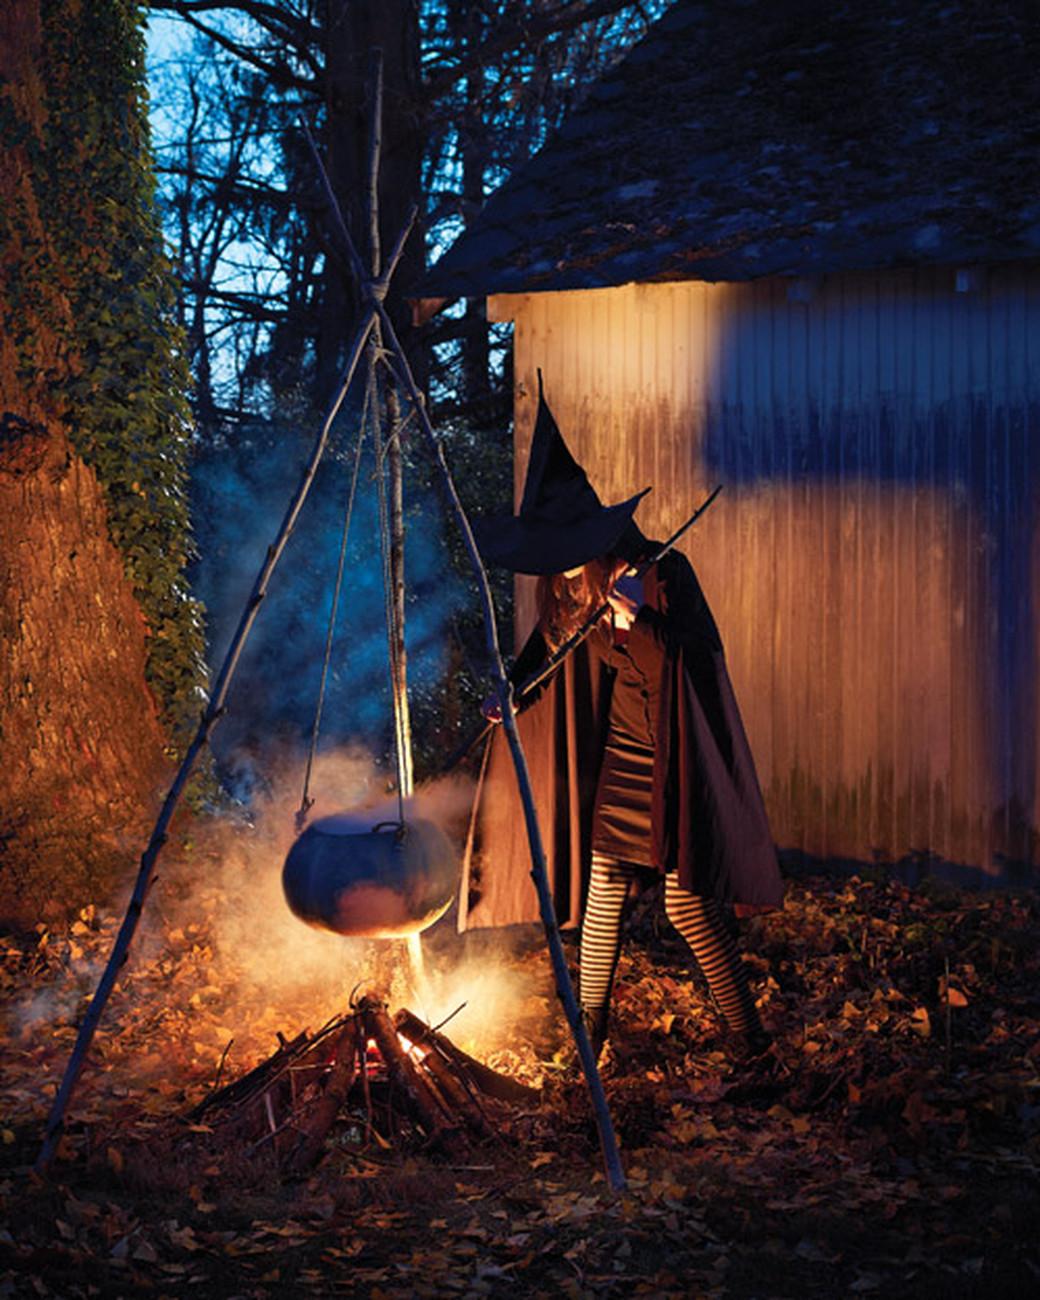 Halloween Decor Outdoor  23 Festive Halloween Witch Decor DIY Ideas